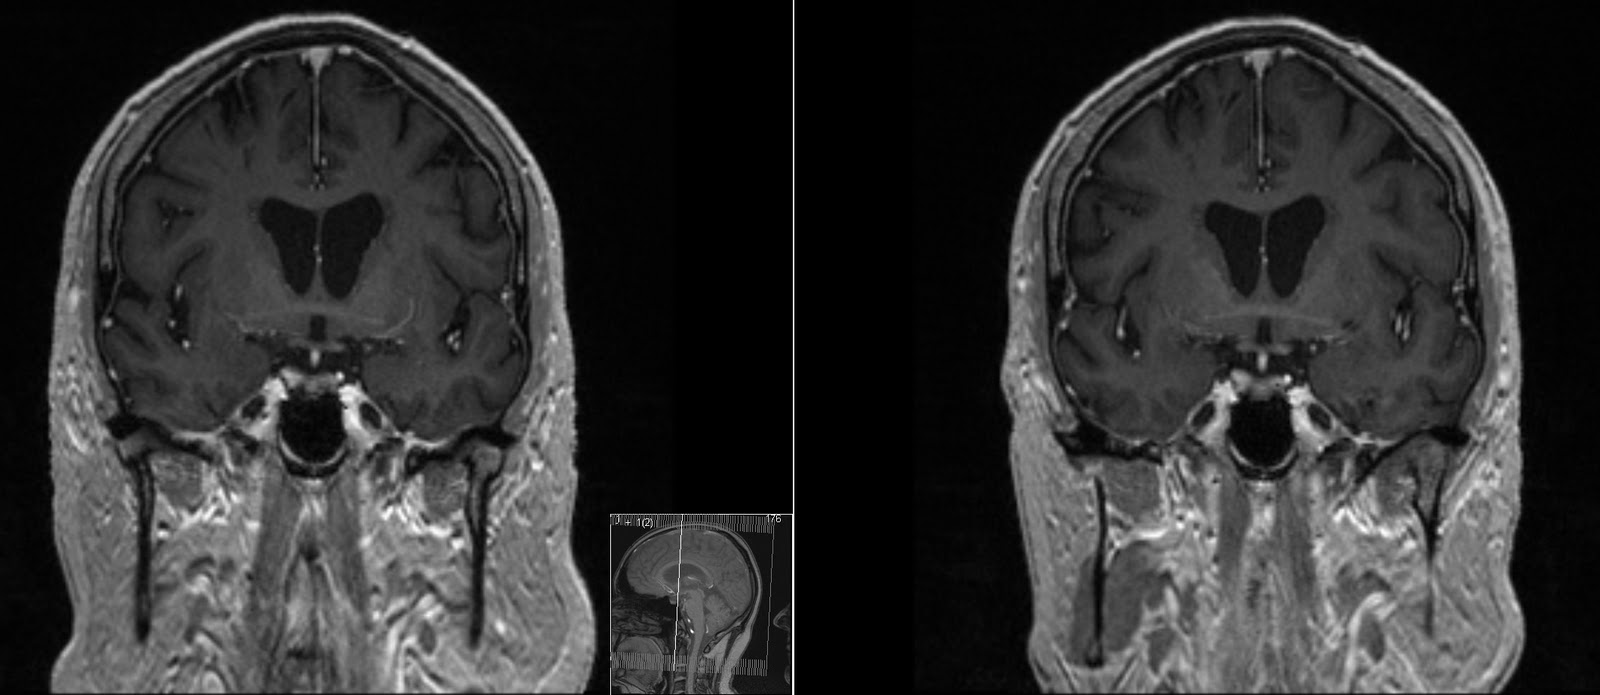 Radiology Mri Anterior Commissure